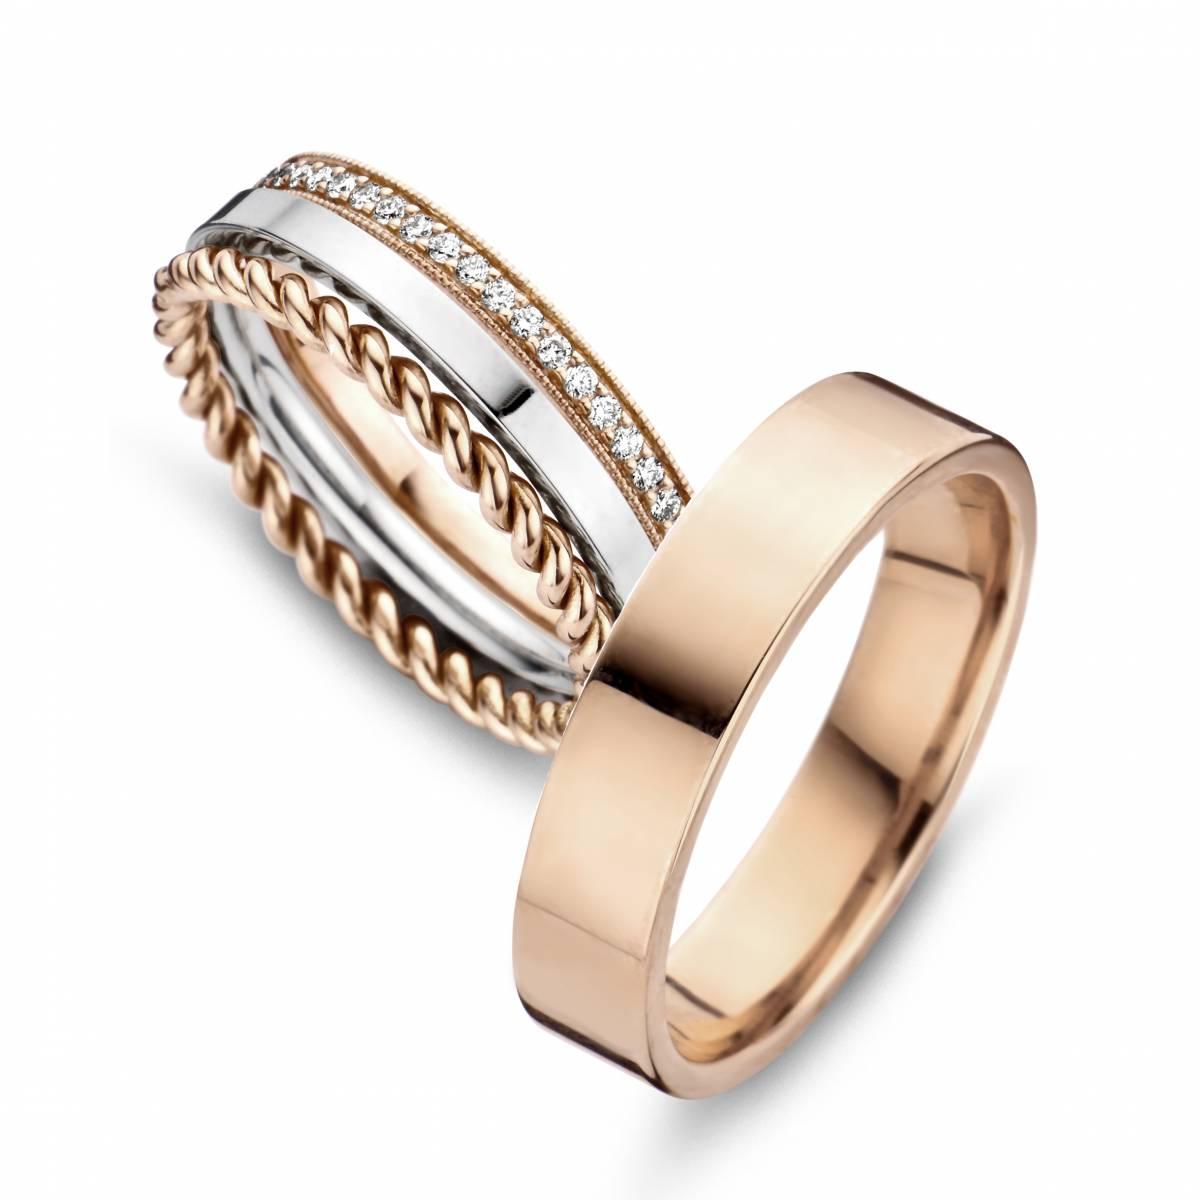 Juwelier Vandromme - Juwelen - Trouwring - Verlovingsring – House of Weddings - 9